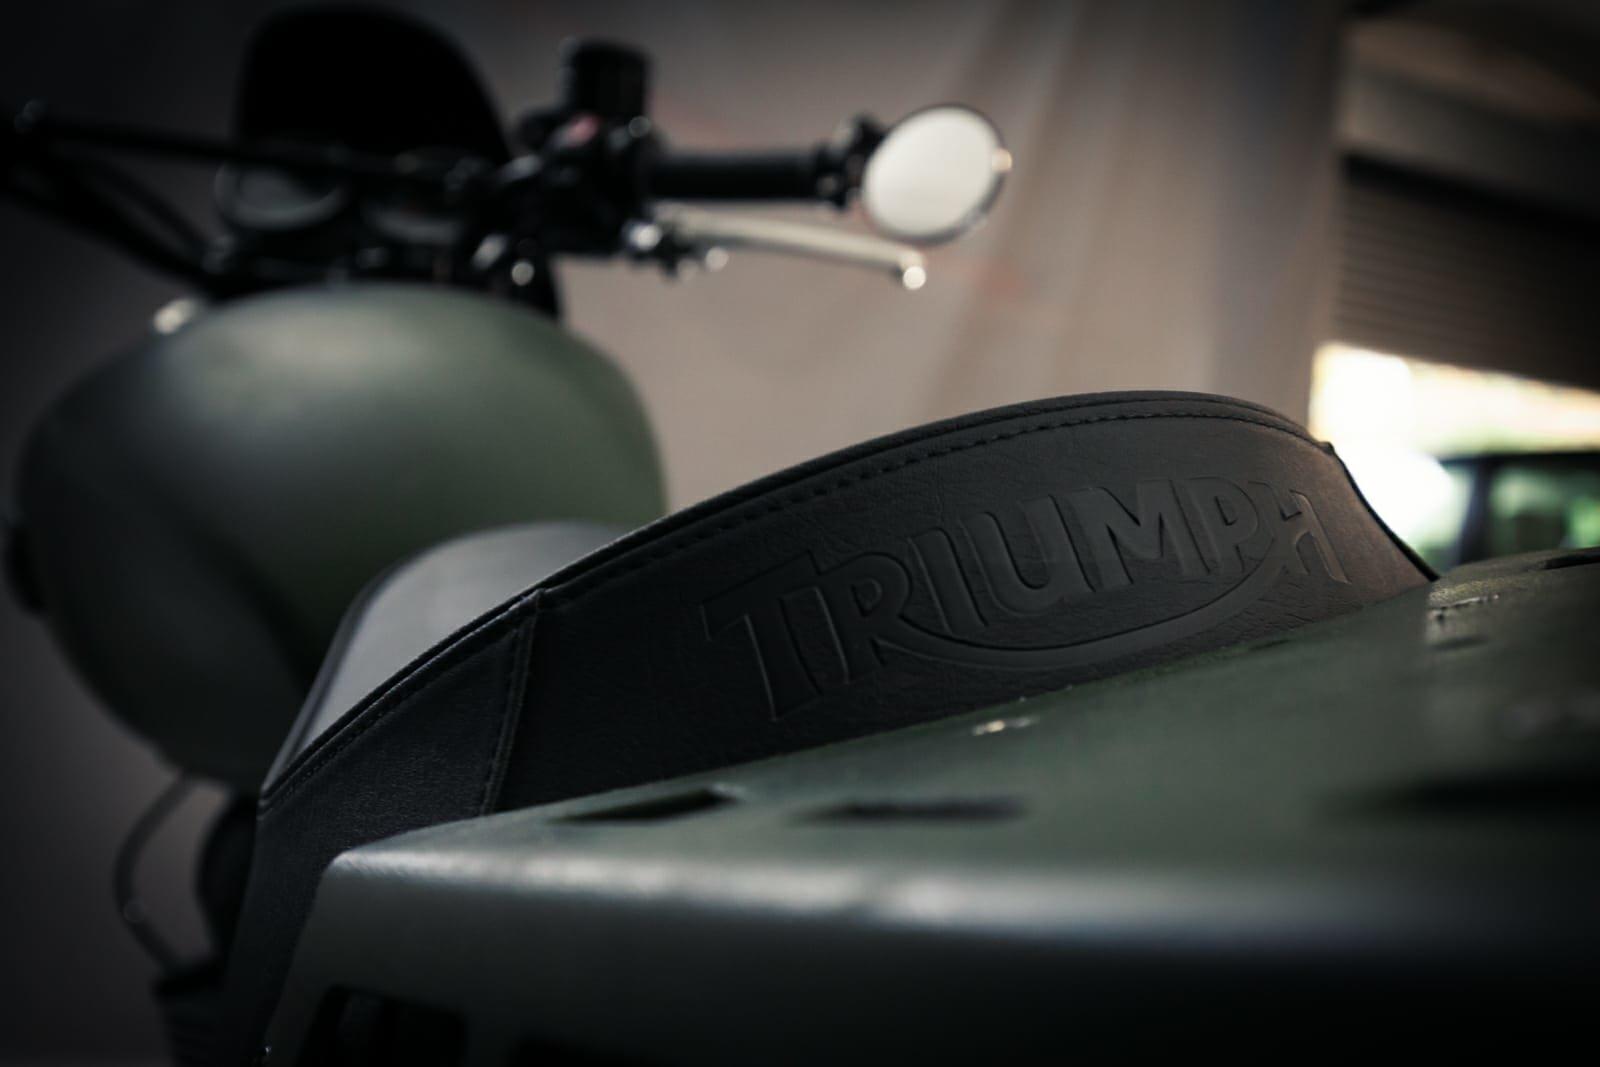 2015 Triumph Bonneville Scrambler Mcqueen tribute For Sale (picture 4 of 6)